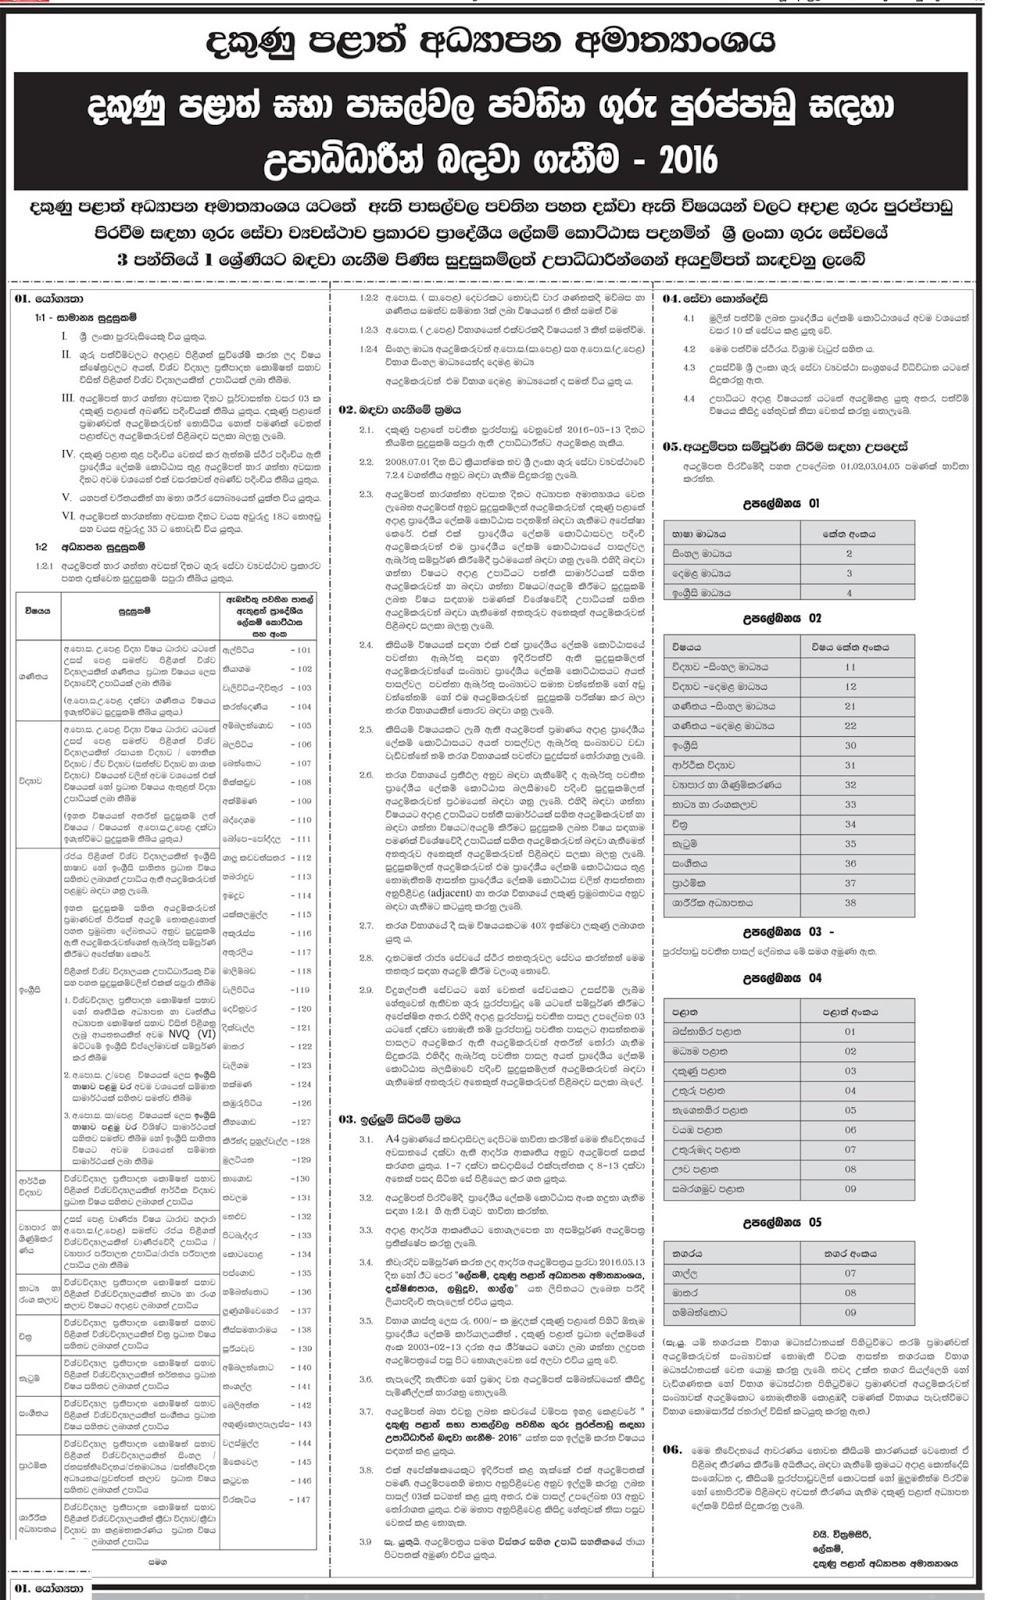 February 2017 Examination Conducted By Department Of Examinations Sri Lanka